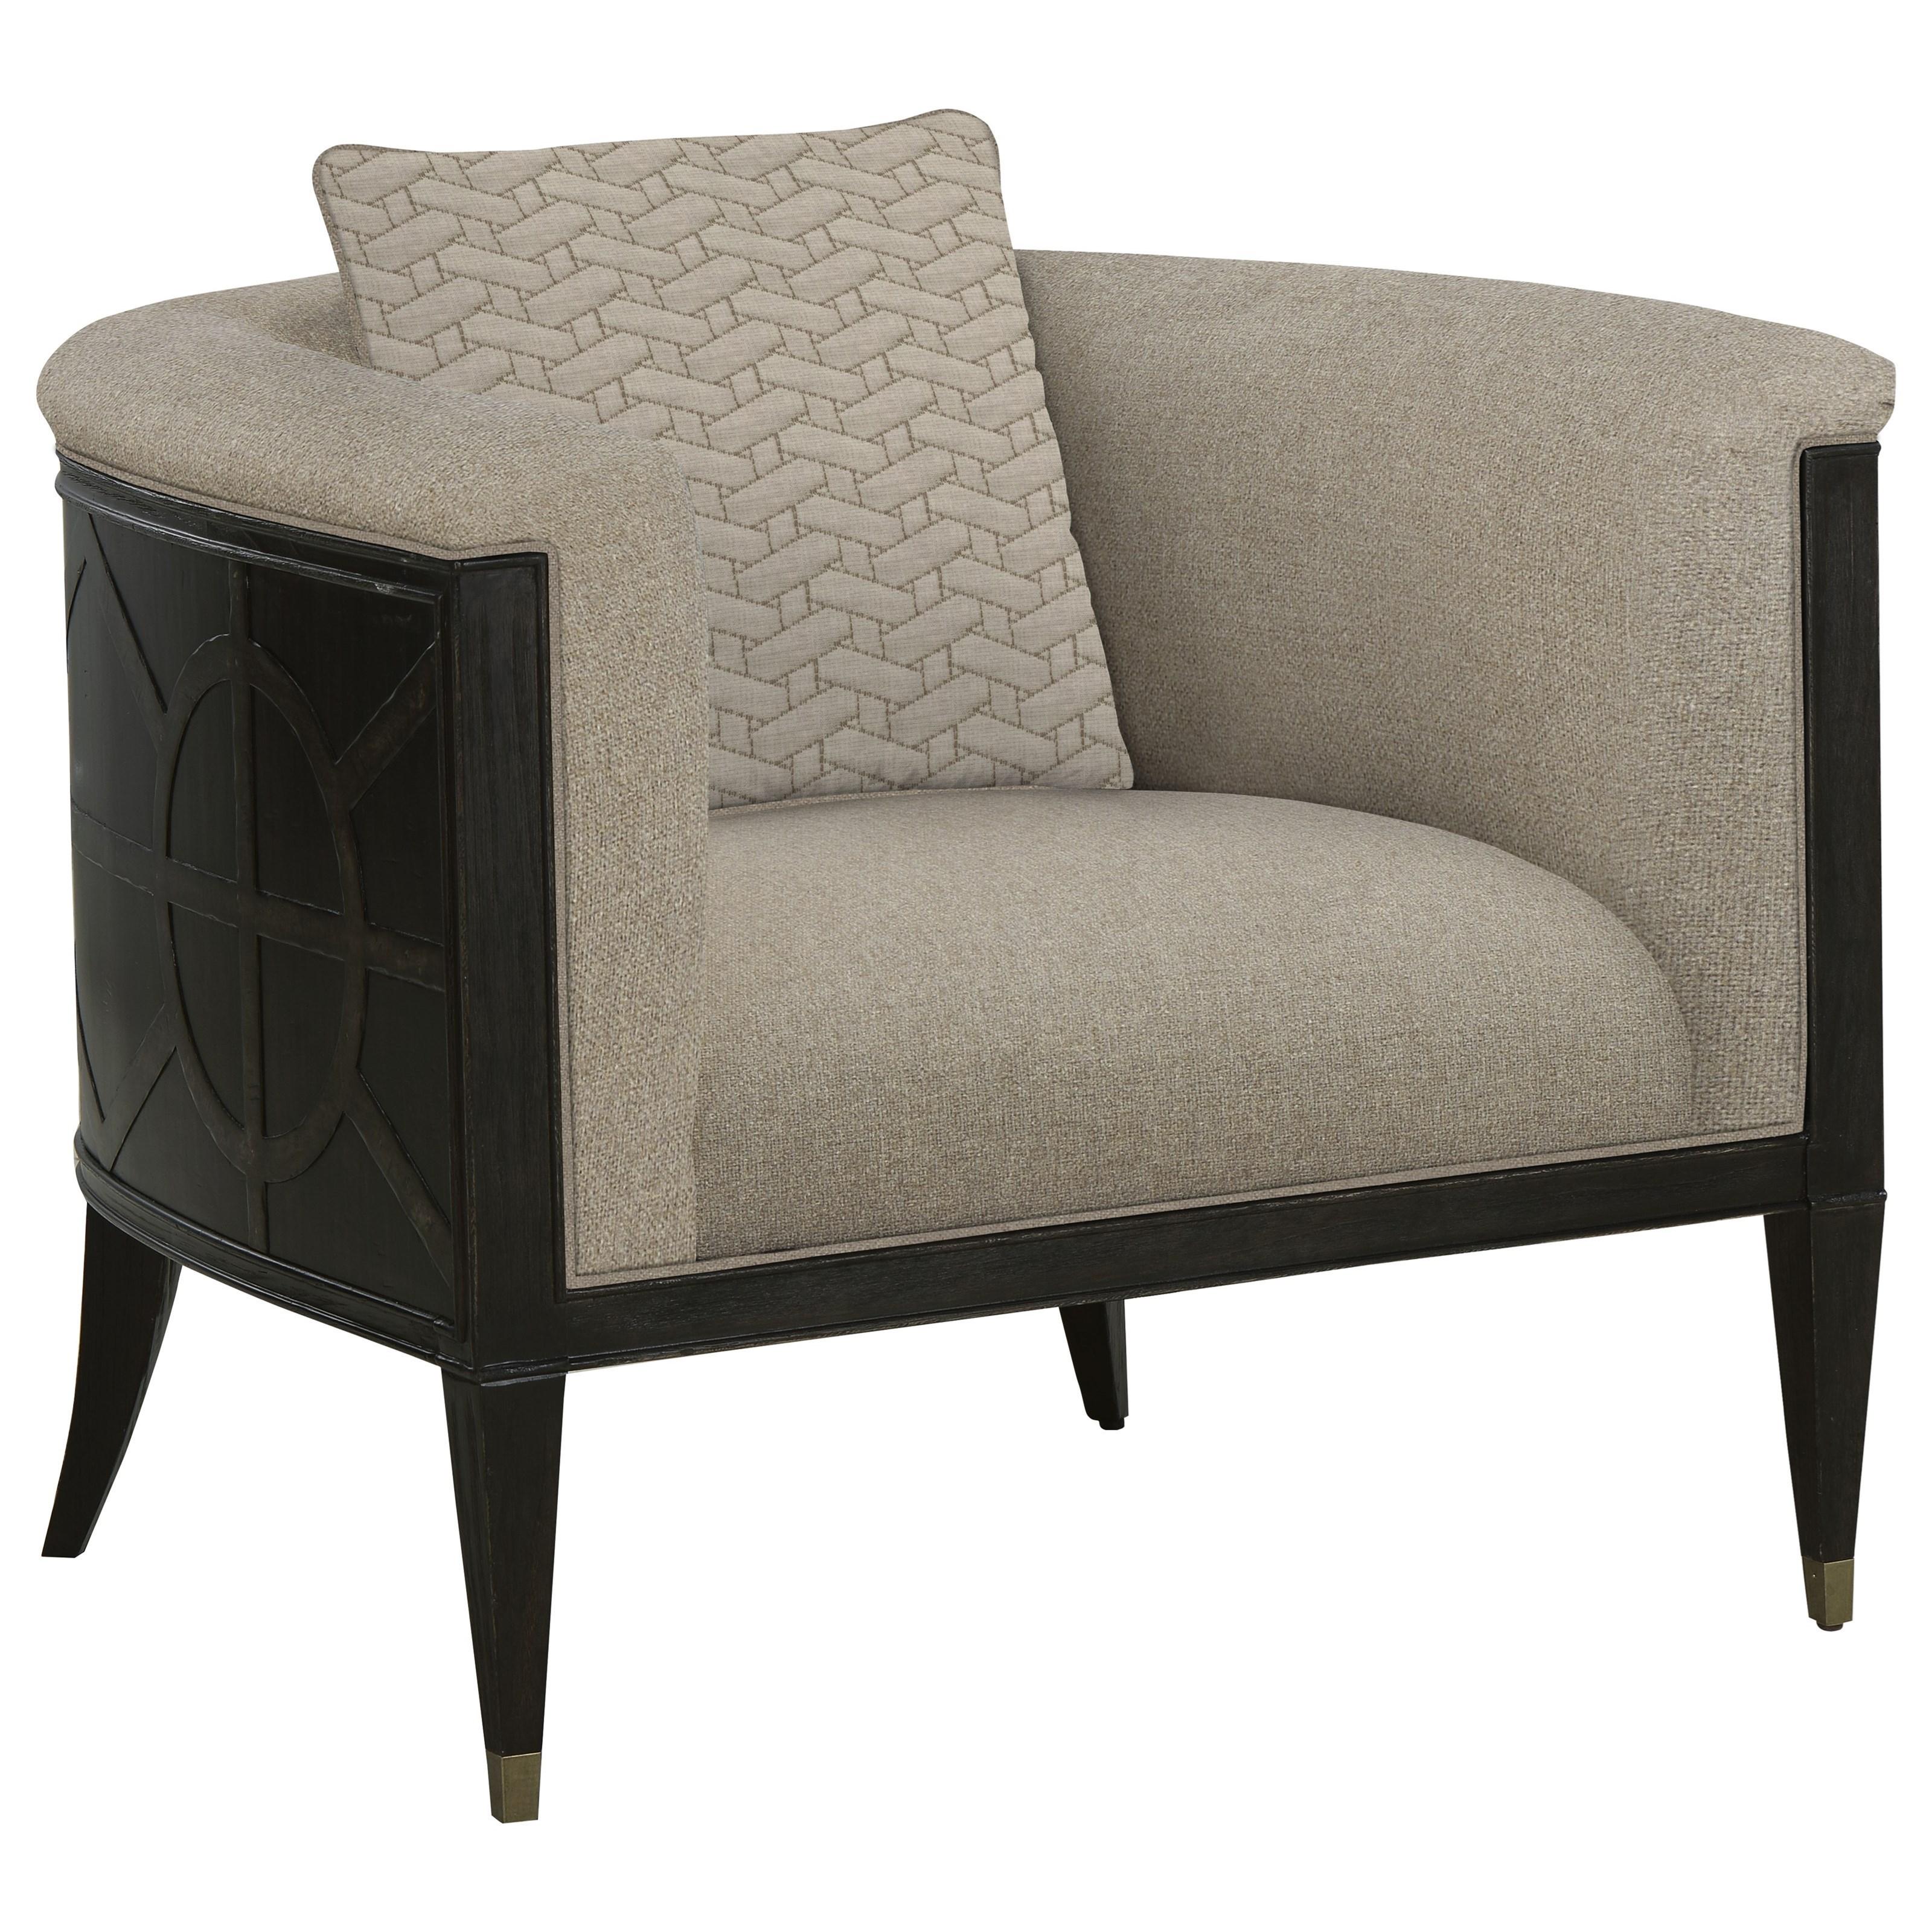 Timber Barrel Chair